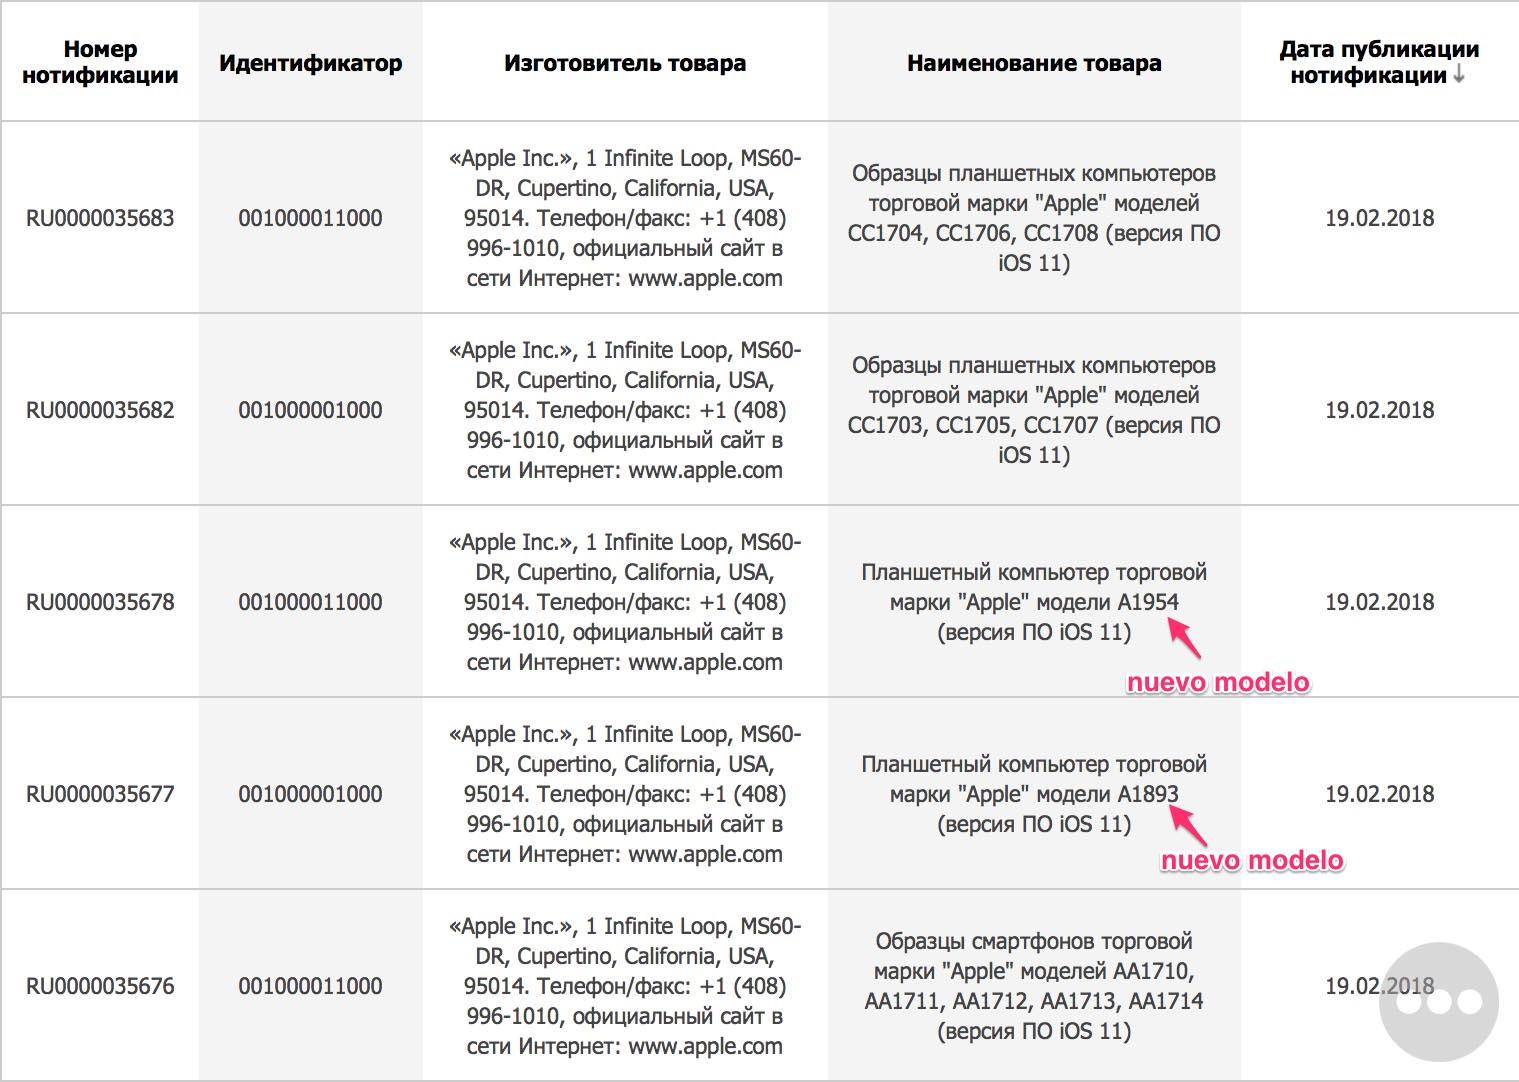 Registro de la Eurasian Economic Commission